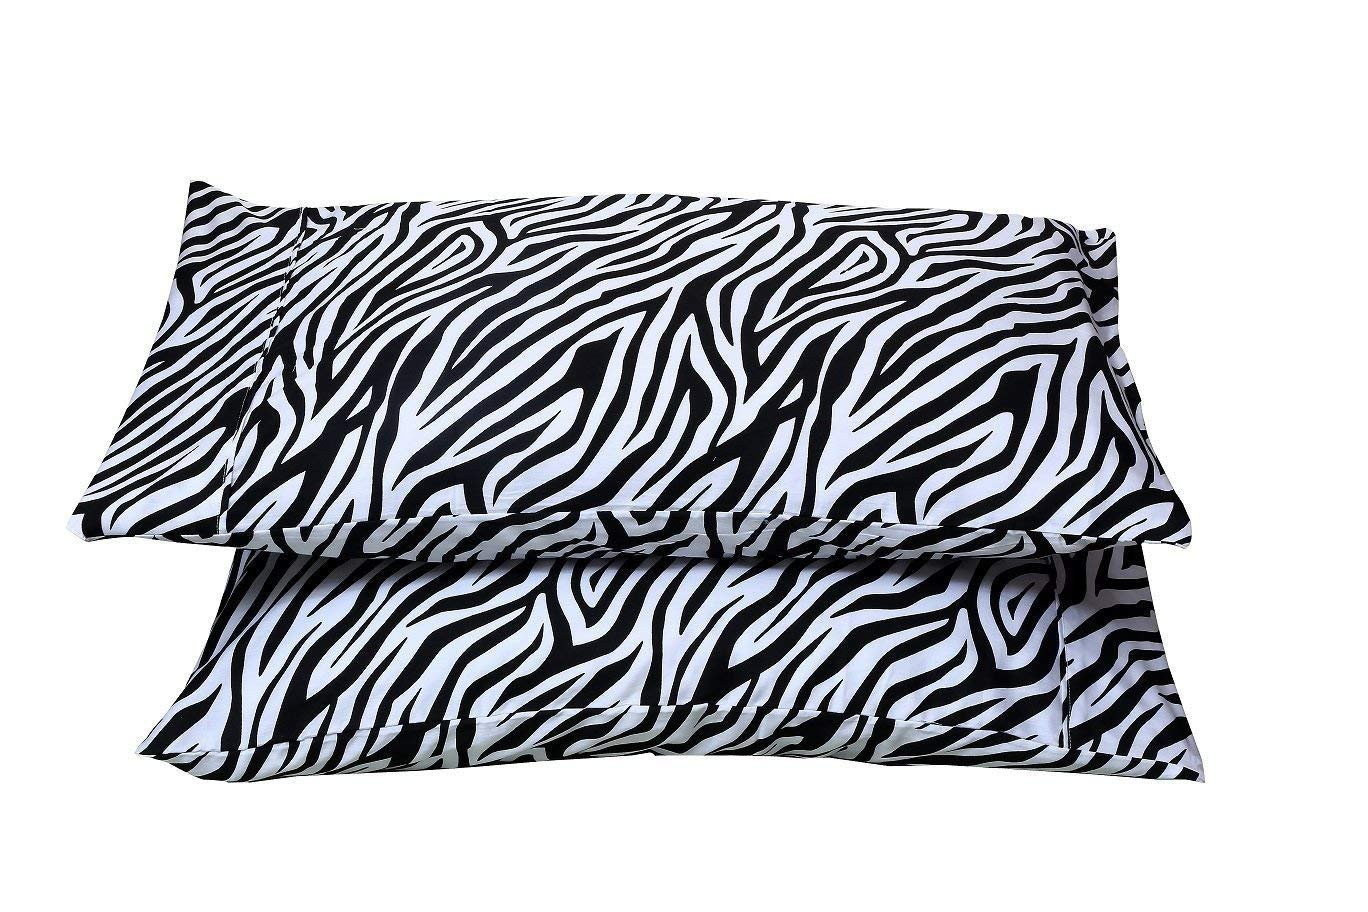 Standard, Zebra Print - 4'' Hems Set of 2 Pillowcases 400 Thread Count 100% Long Staple Cotton Luxury Hotel Quality Printed